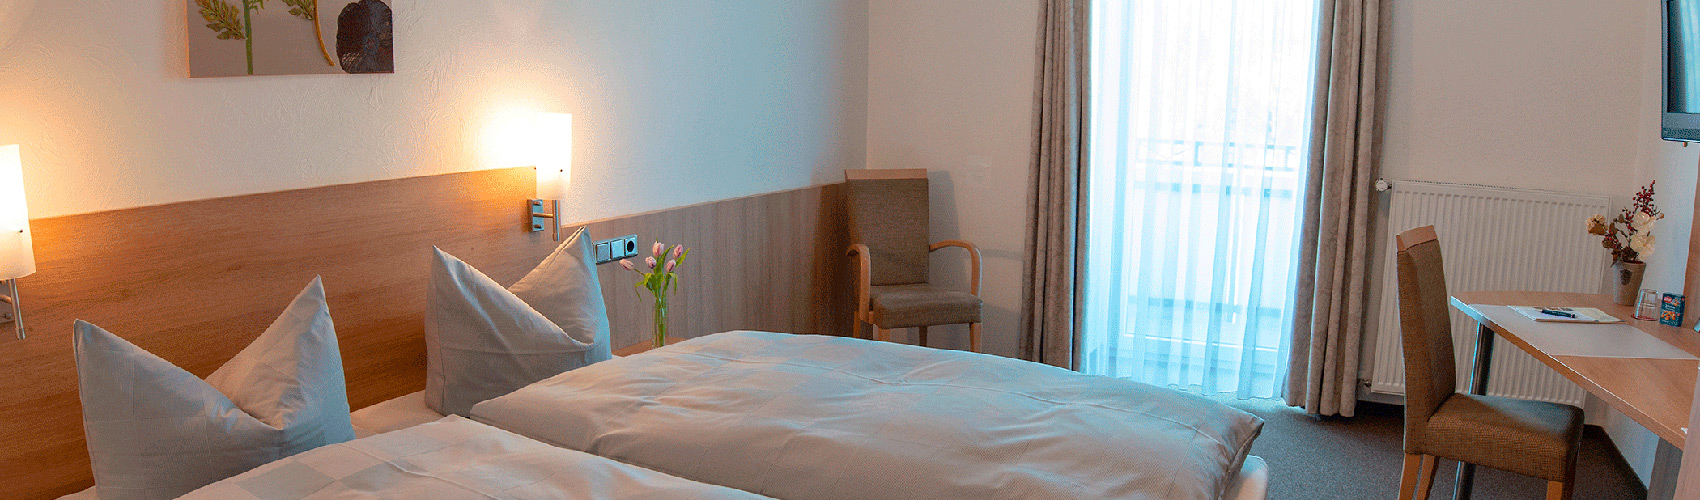 hotel-1700-2